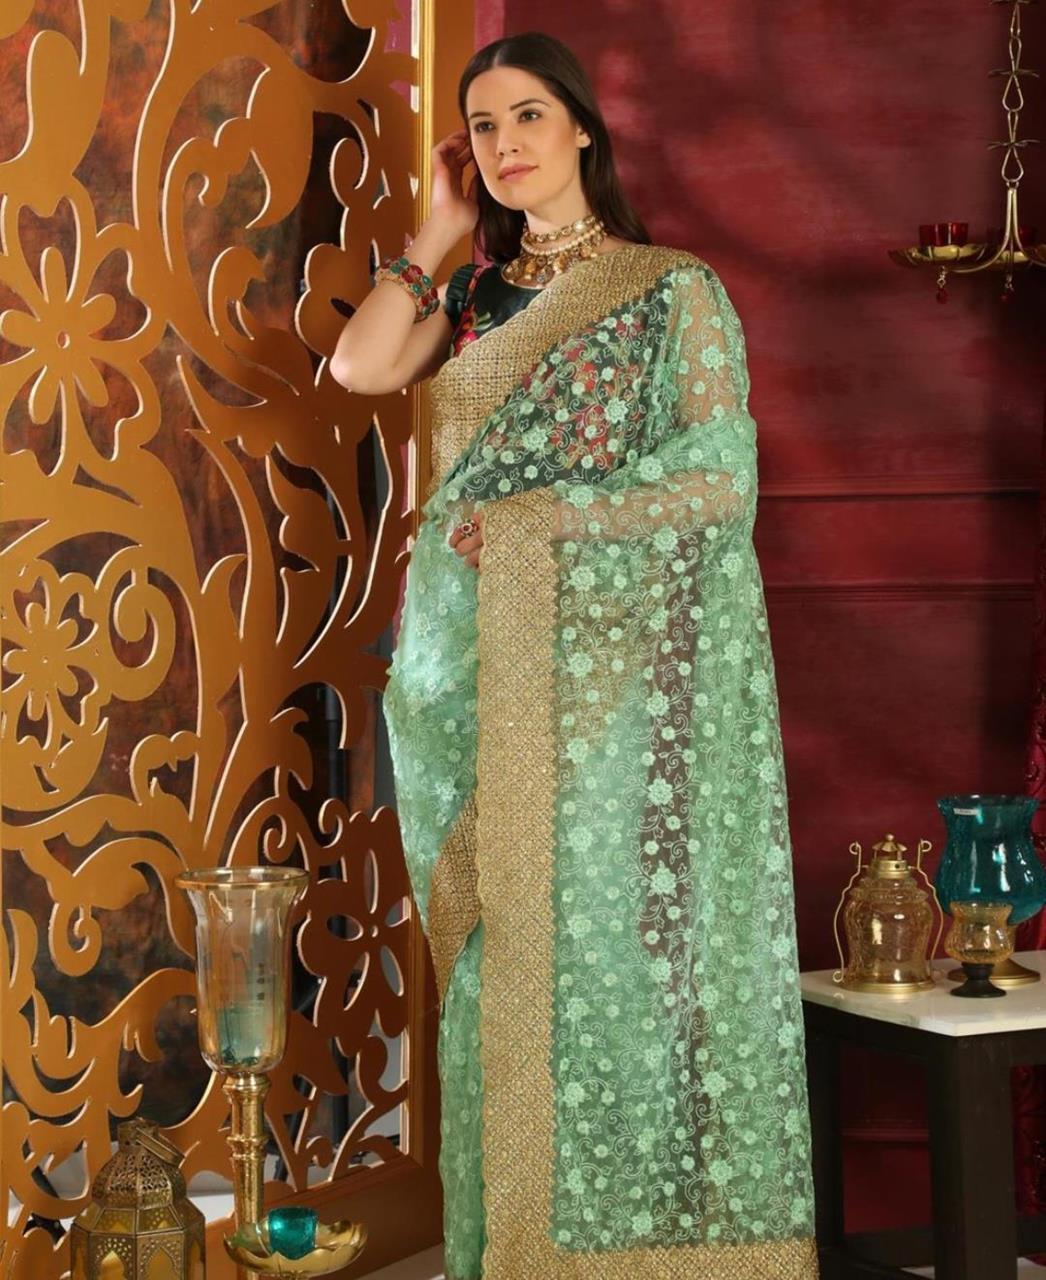 Embroidered Silk Saree (Sari) in MINTCREAM